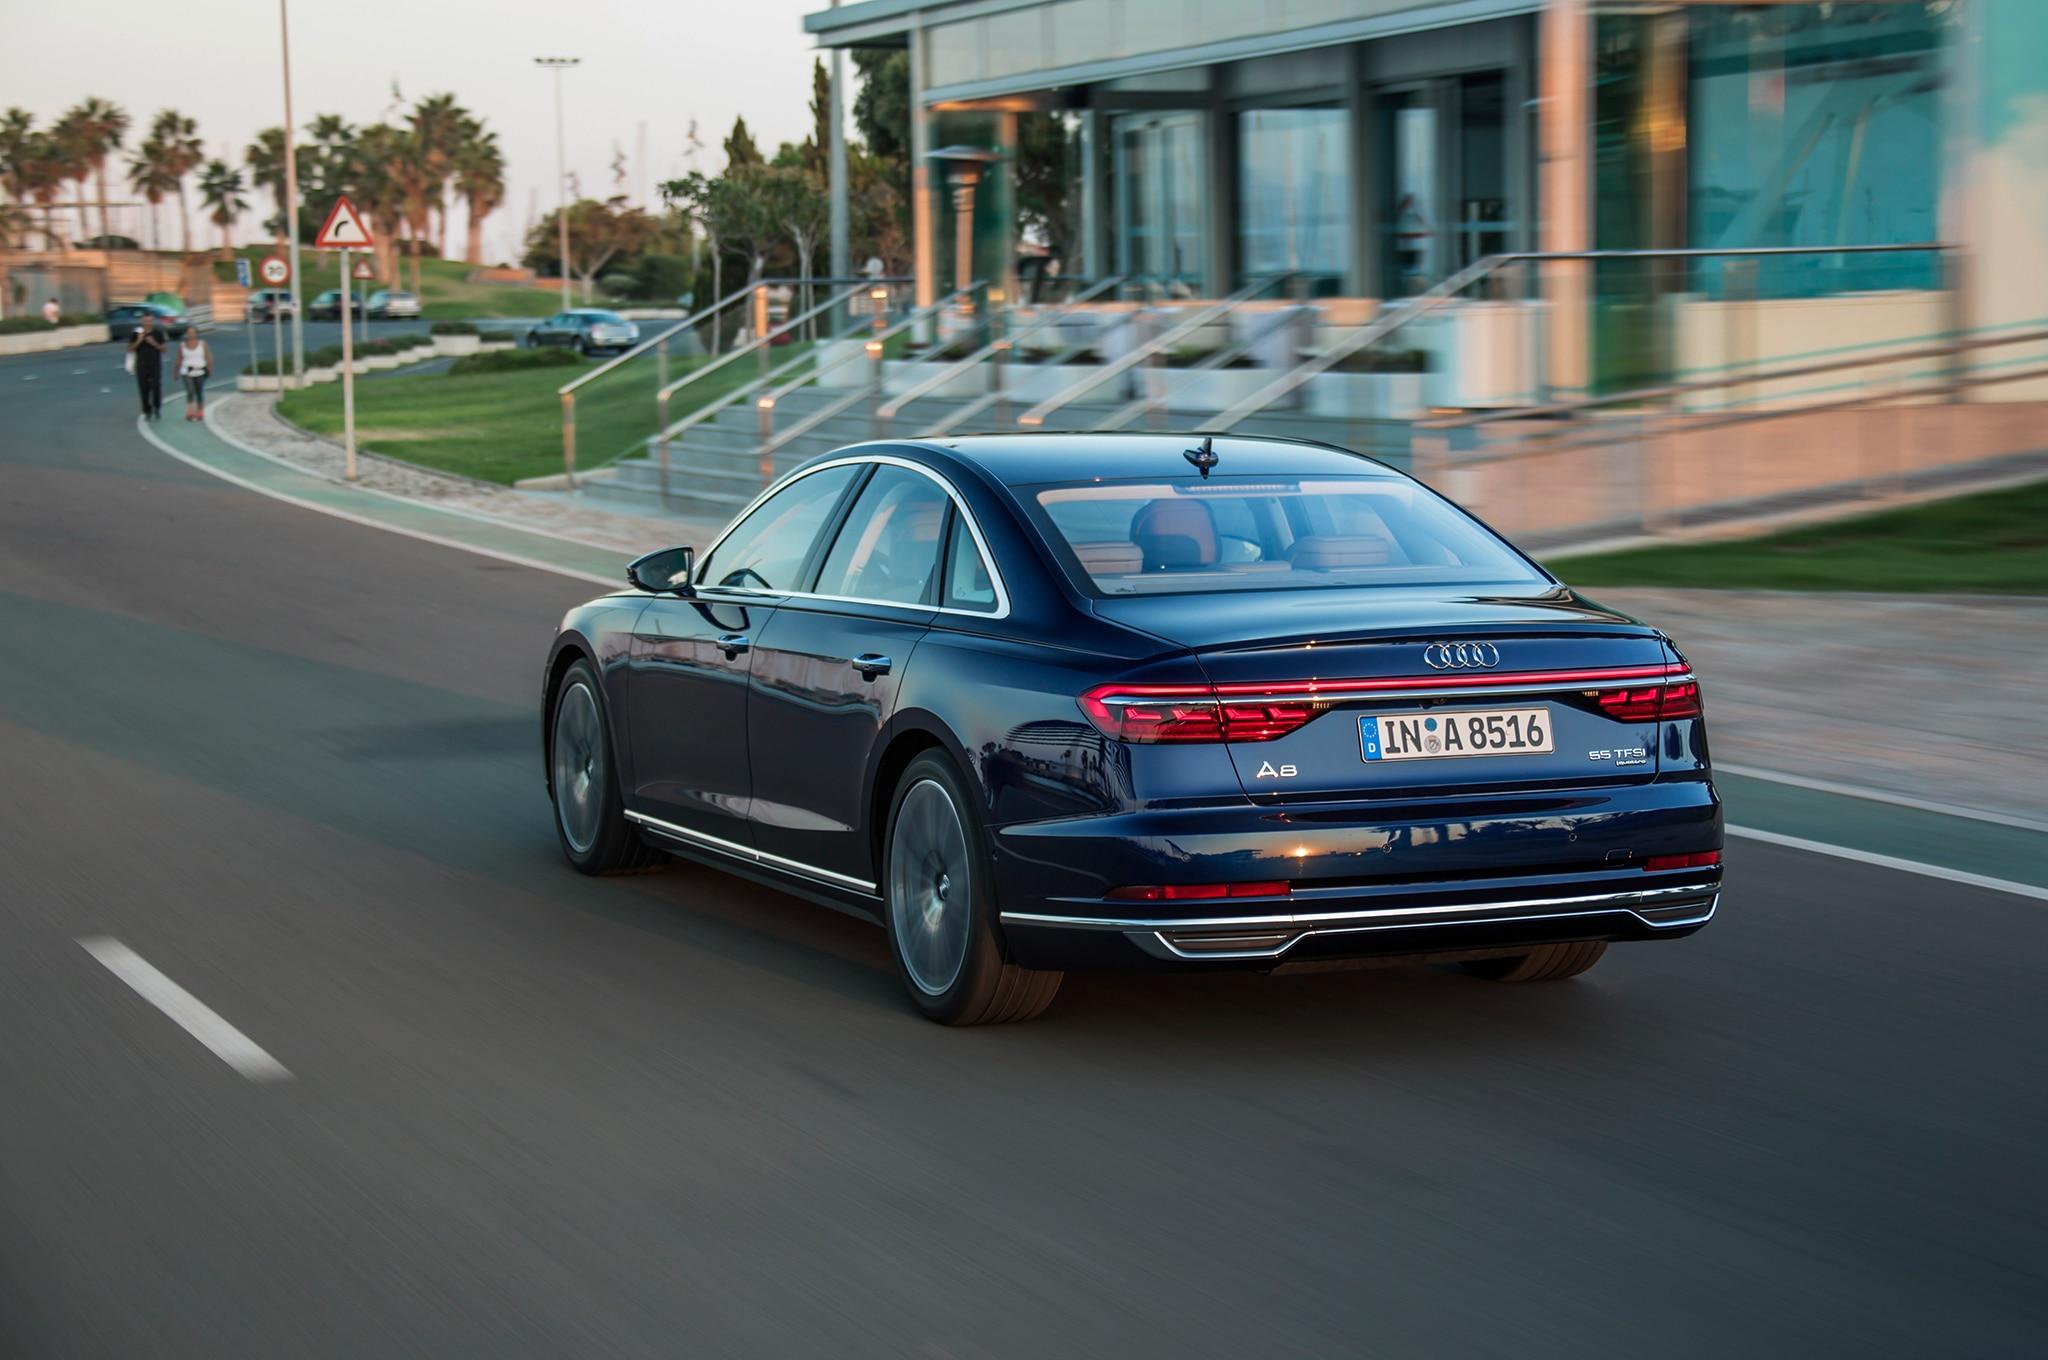 2019 Audi A8 Rear Three Quarter In Motion 13